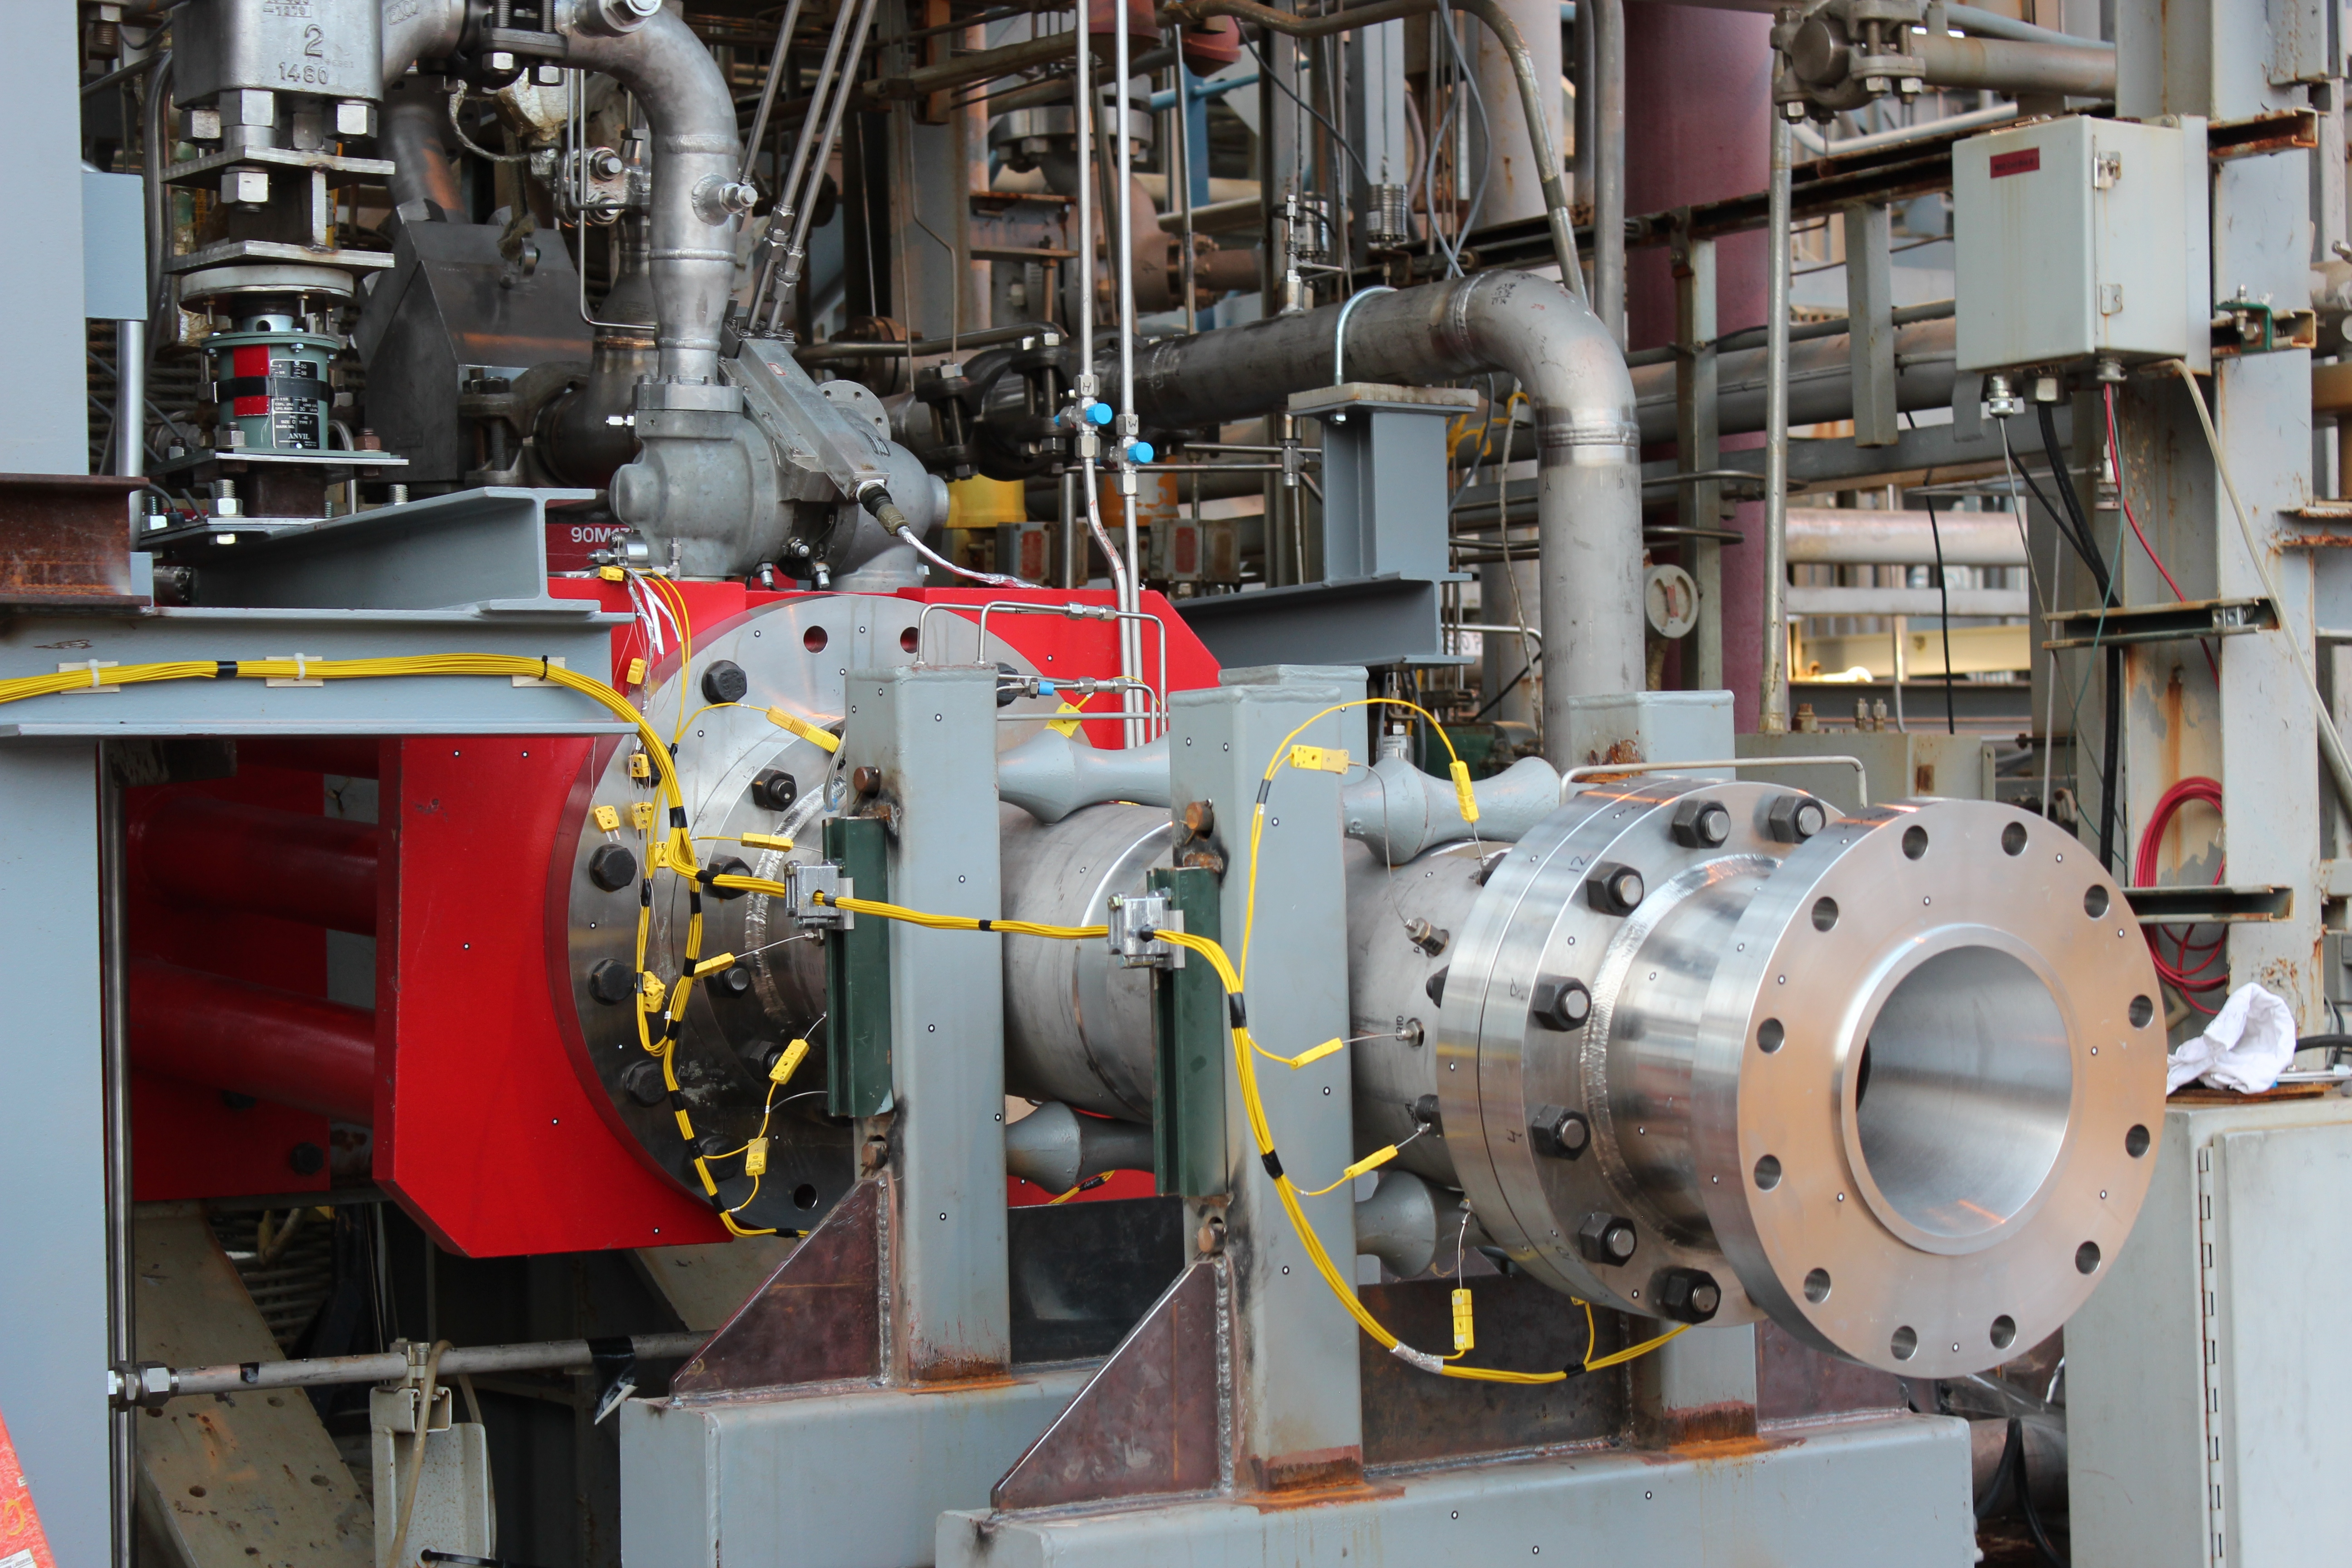 F 1 Gas Generator At Marshalls Test Stand 116 NASA